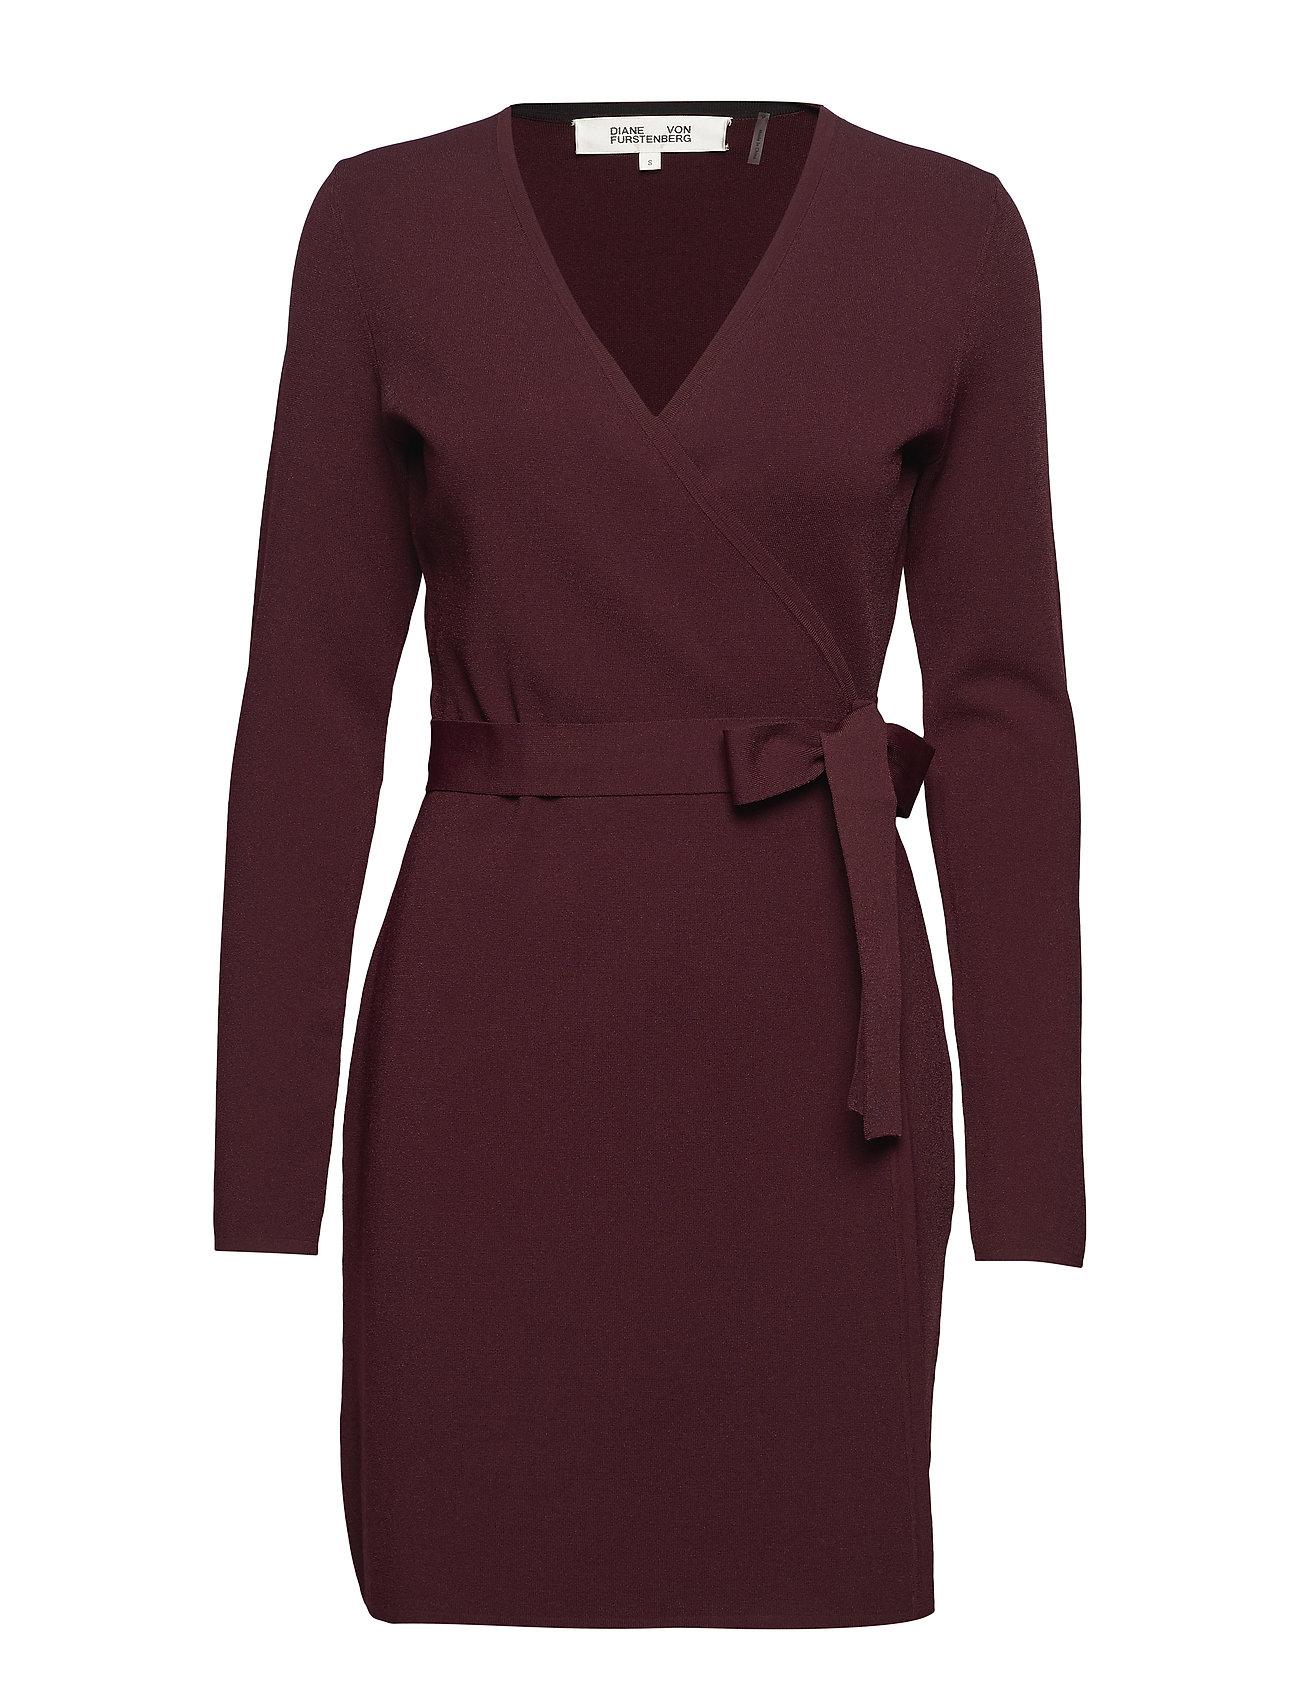 L s V-neck Knit Wrap Dress (Cabernet) (235.95 €) - Diane von ... 1055bb411